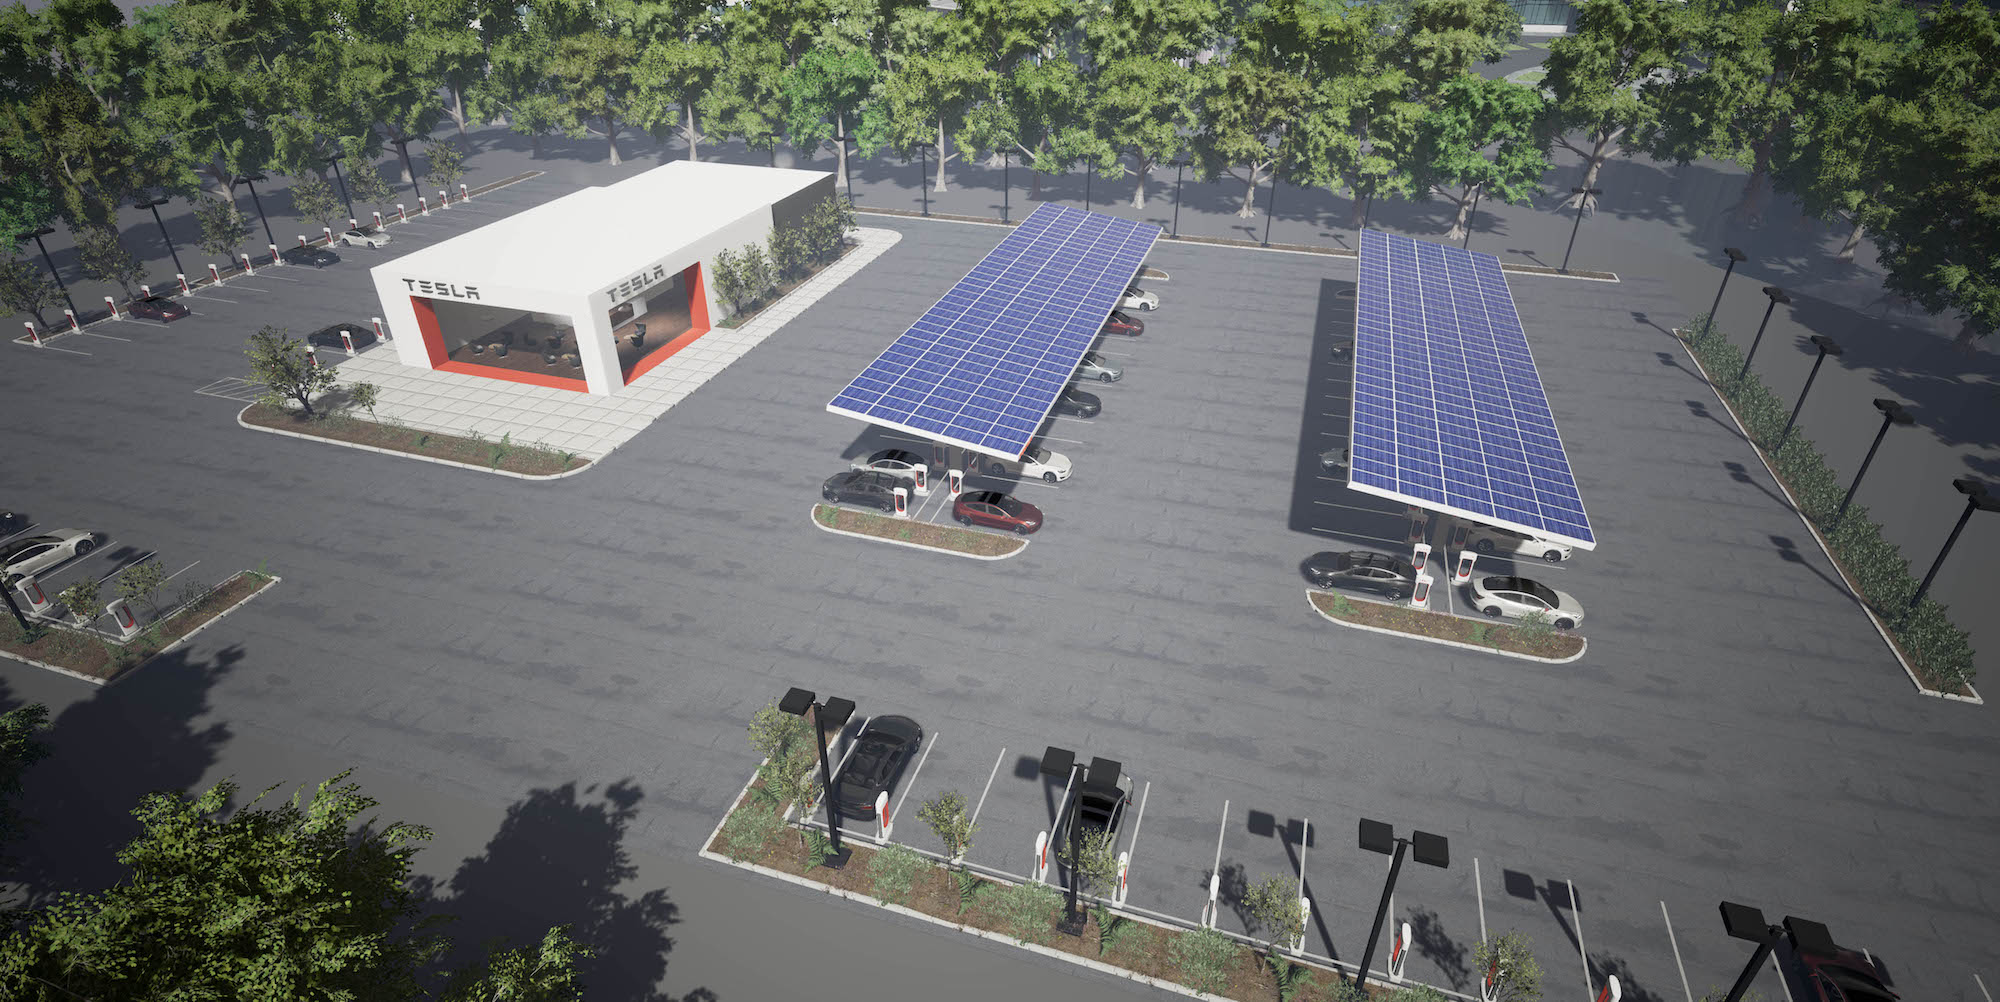 Tesla Aggressively Expanding EV Charging Network